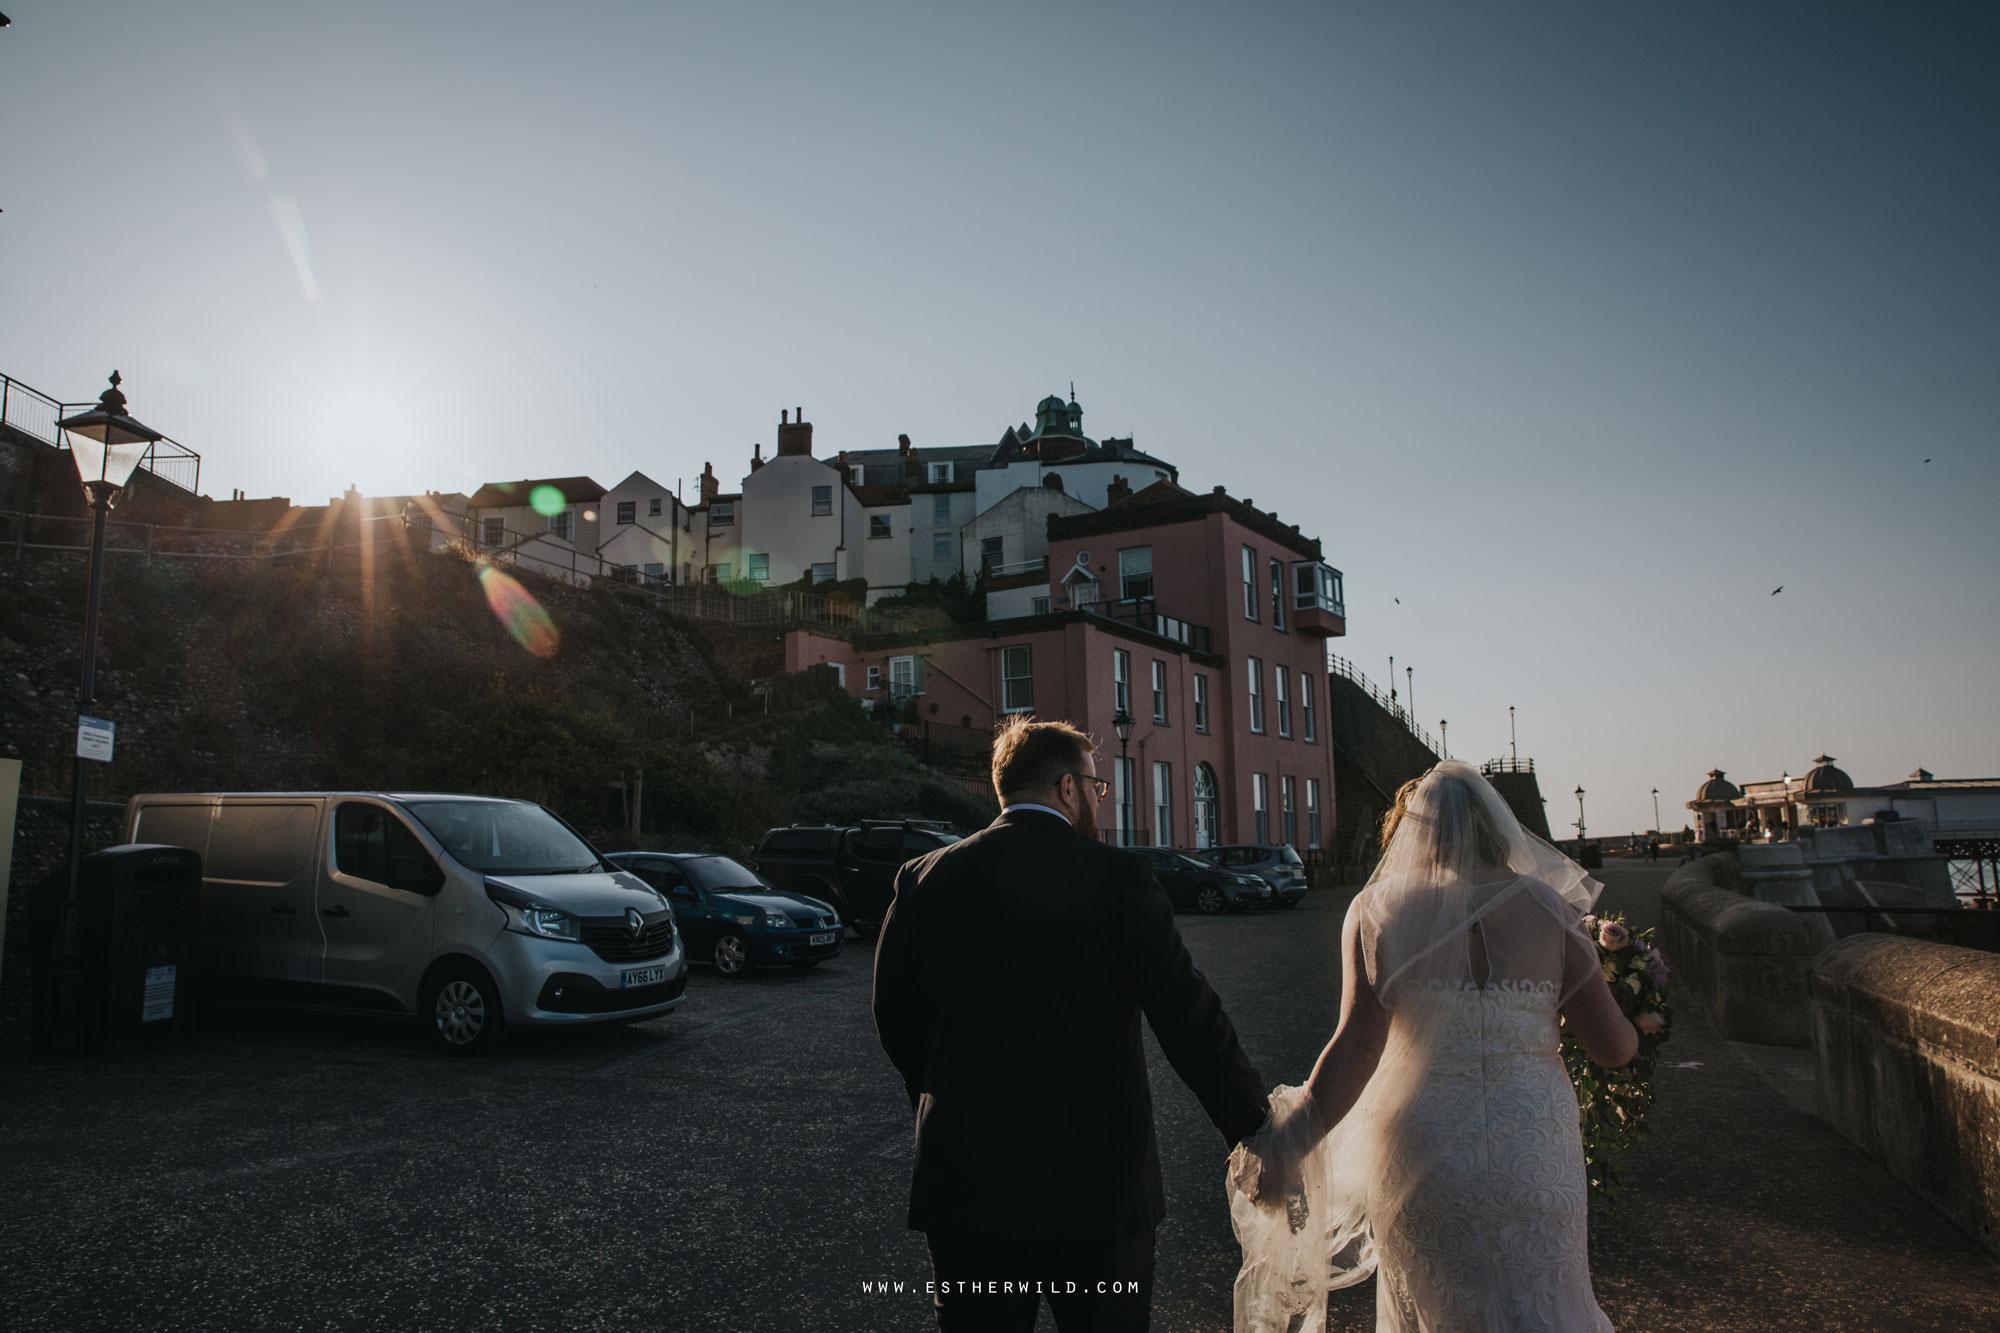 Cromer_Wedding_Beach_Outdoor_Ceremony_Norfolk_North_Lodge_Registry_Office_Rocket_House_Cafe_Cromer_Pier_IMG_4565.jpg